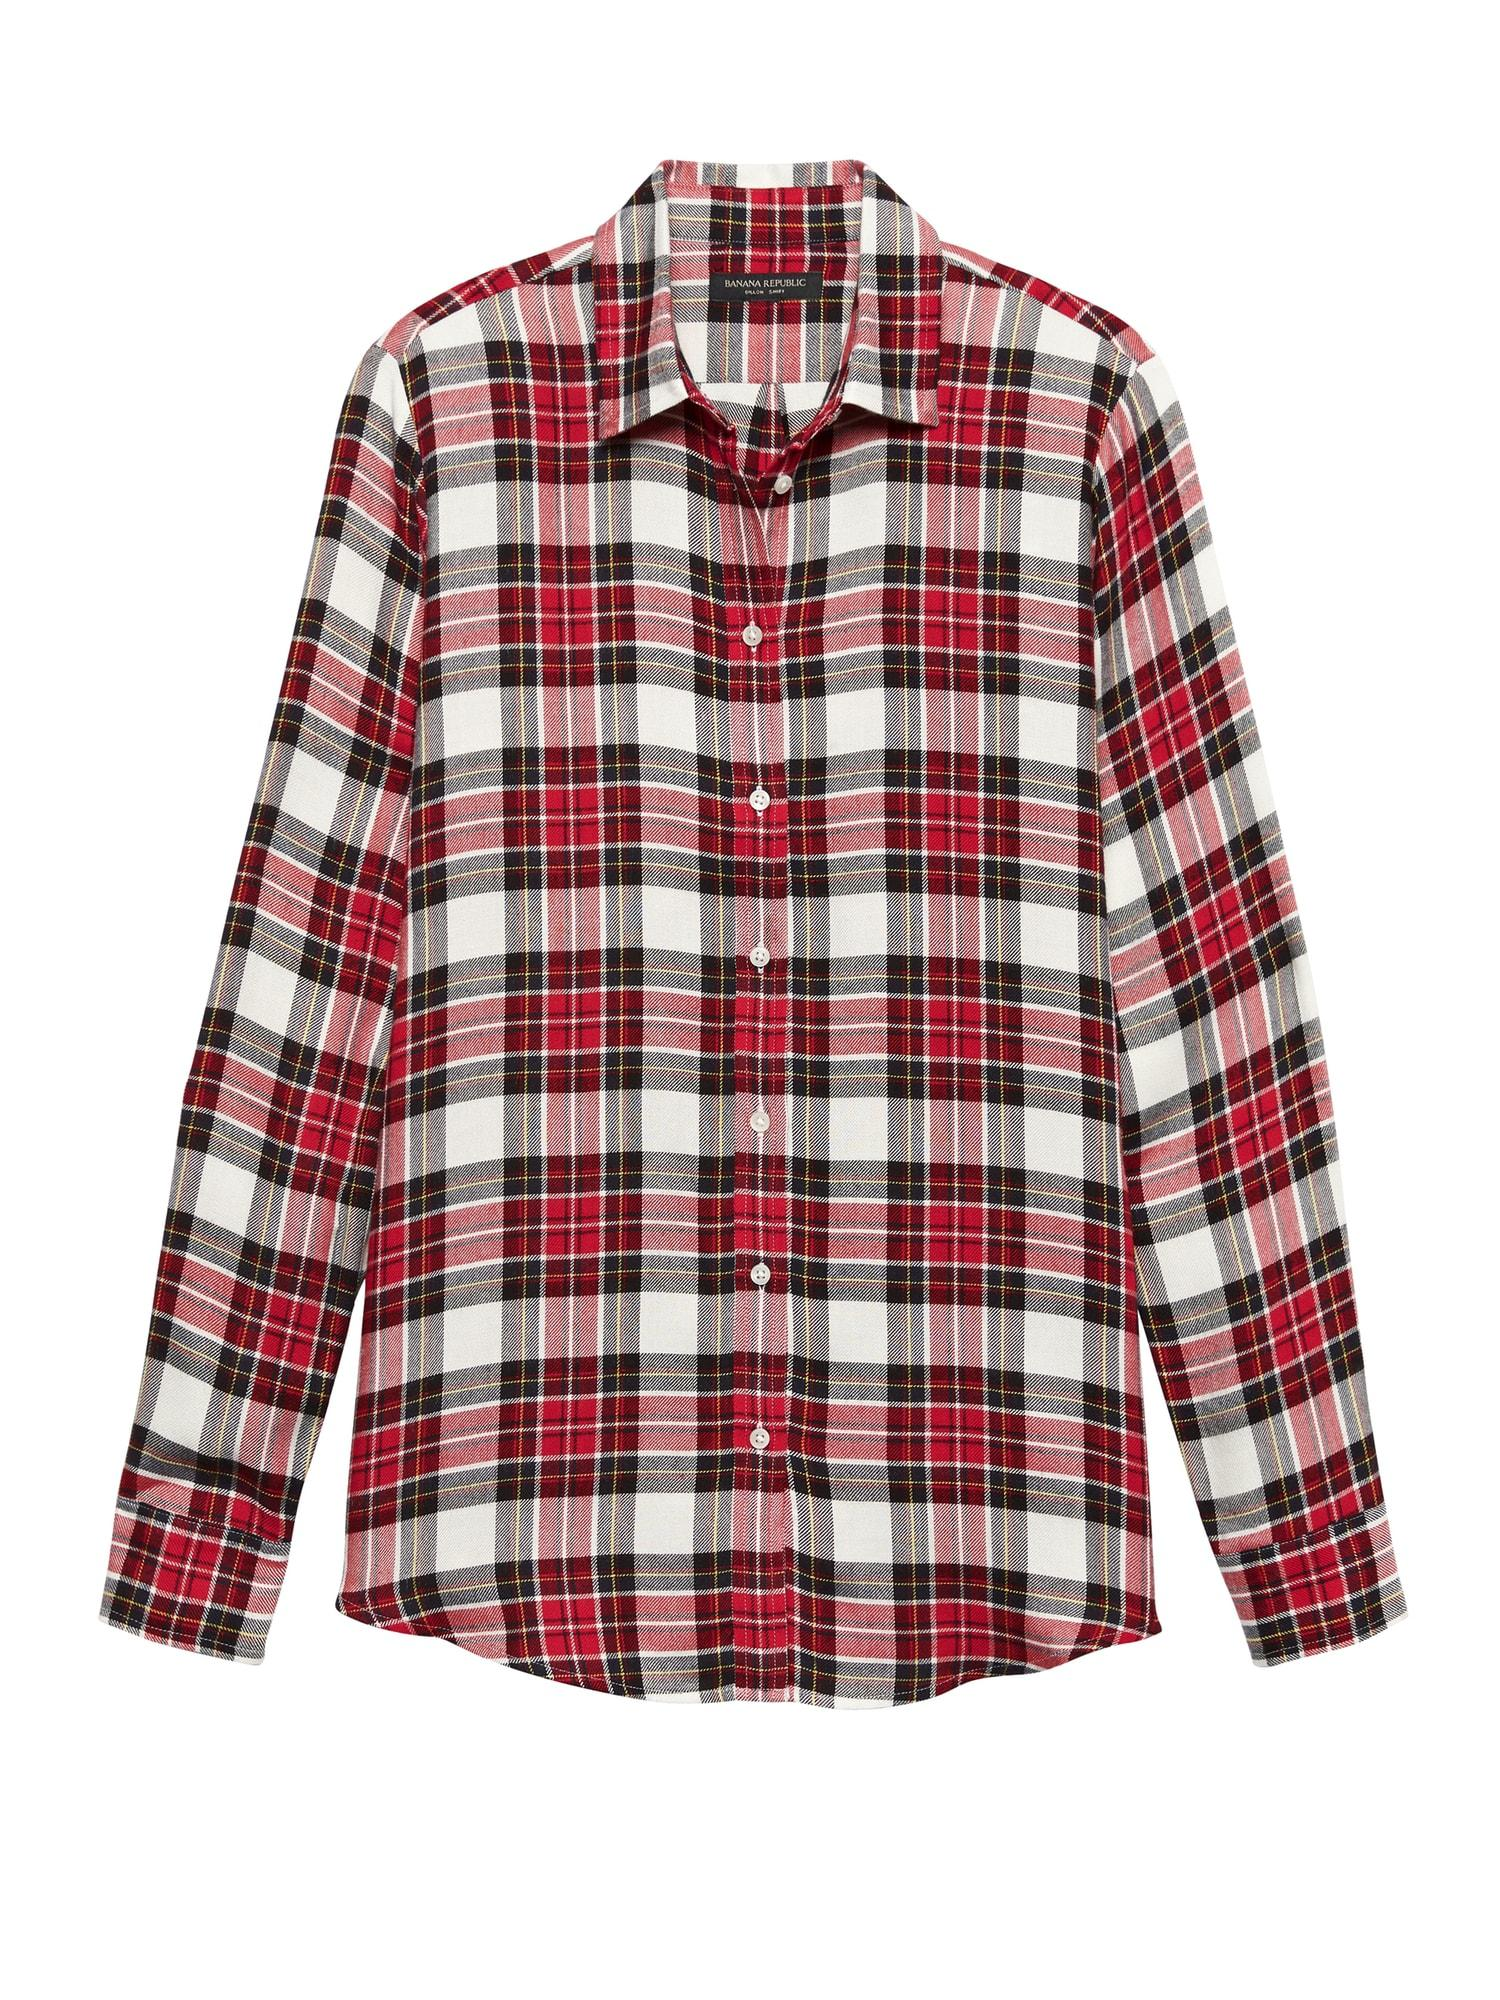 e1f63d7dedc Banana Republic Dillon Classic-fit Tartan Plaid Flannel Shirt in Red ...